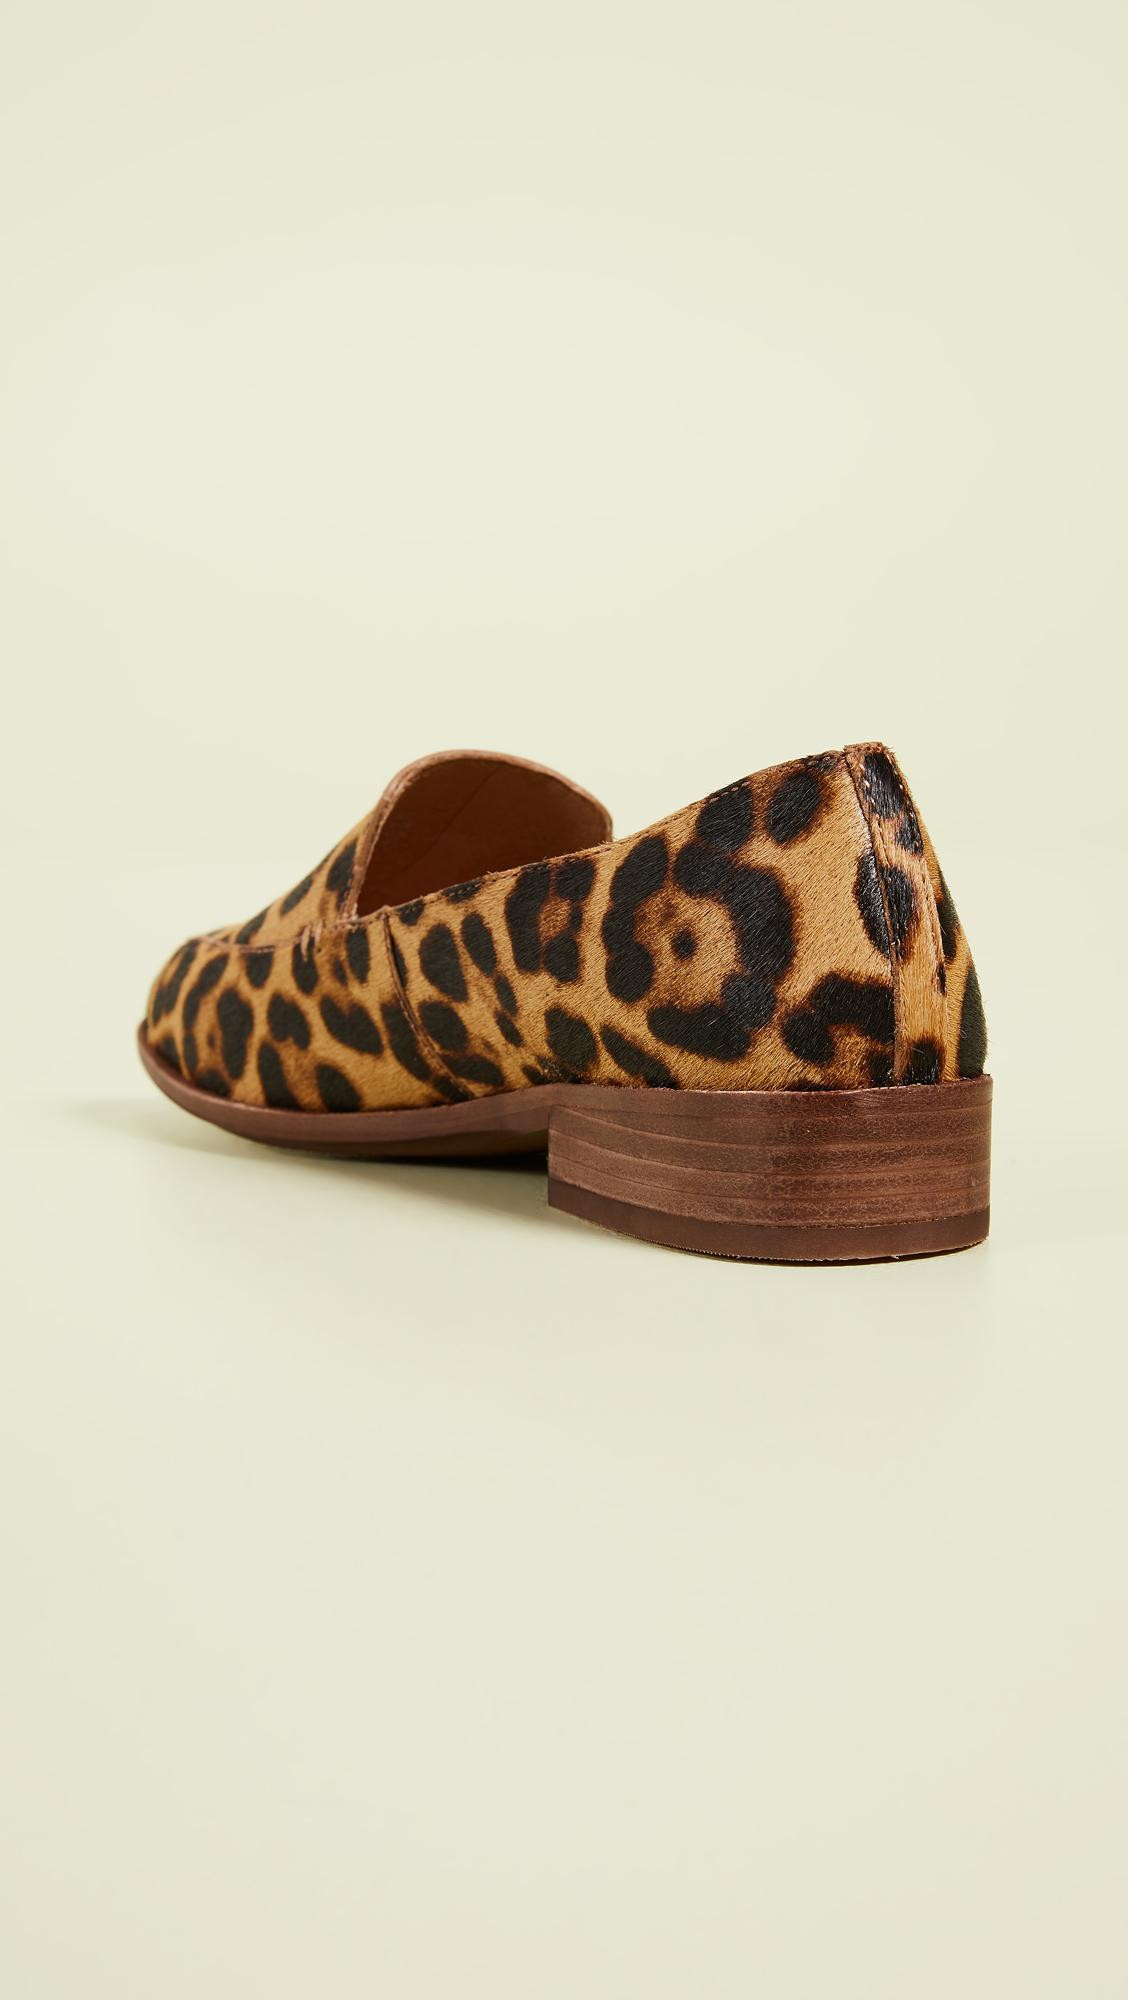 034e104e57b Madewell - Multicolor Frances Leopard Loafers - Lyst. View fullscreen